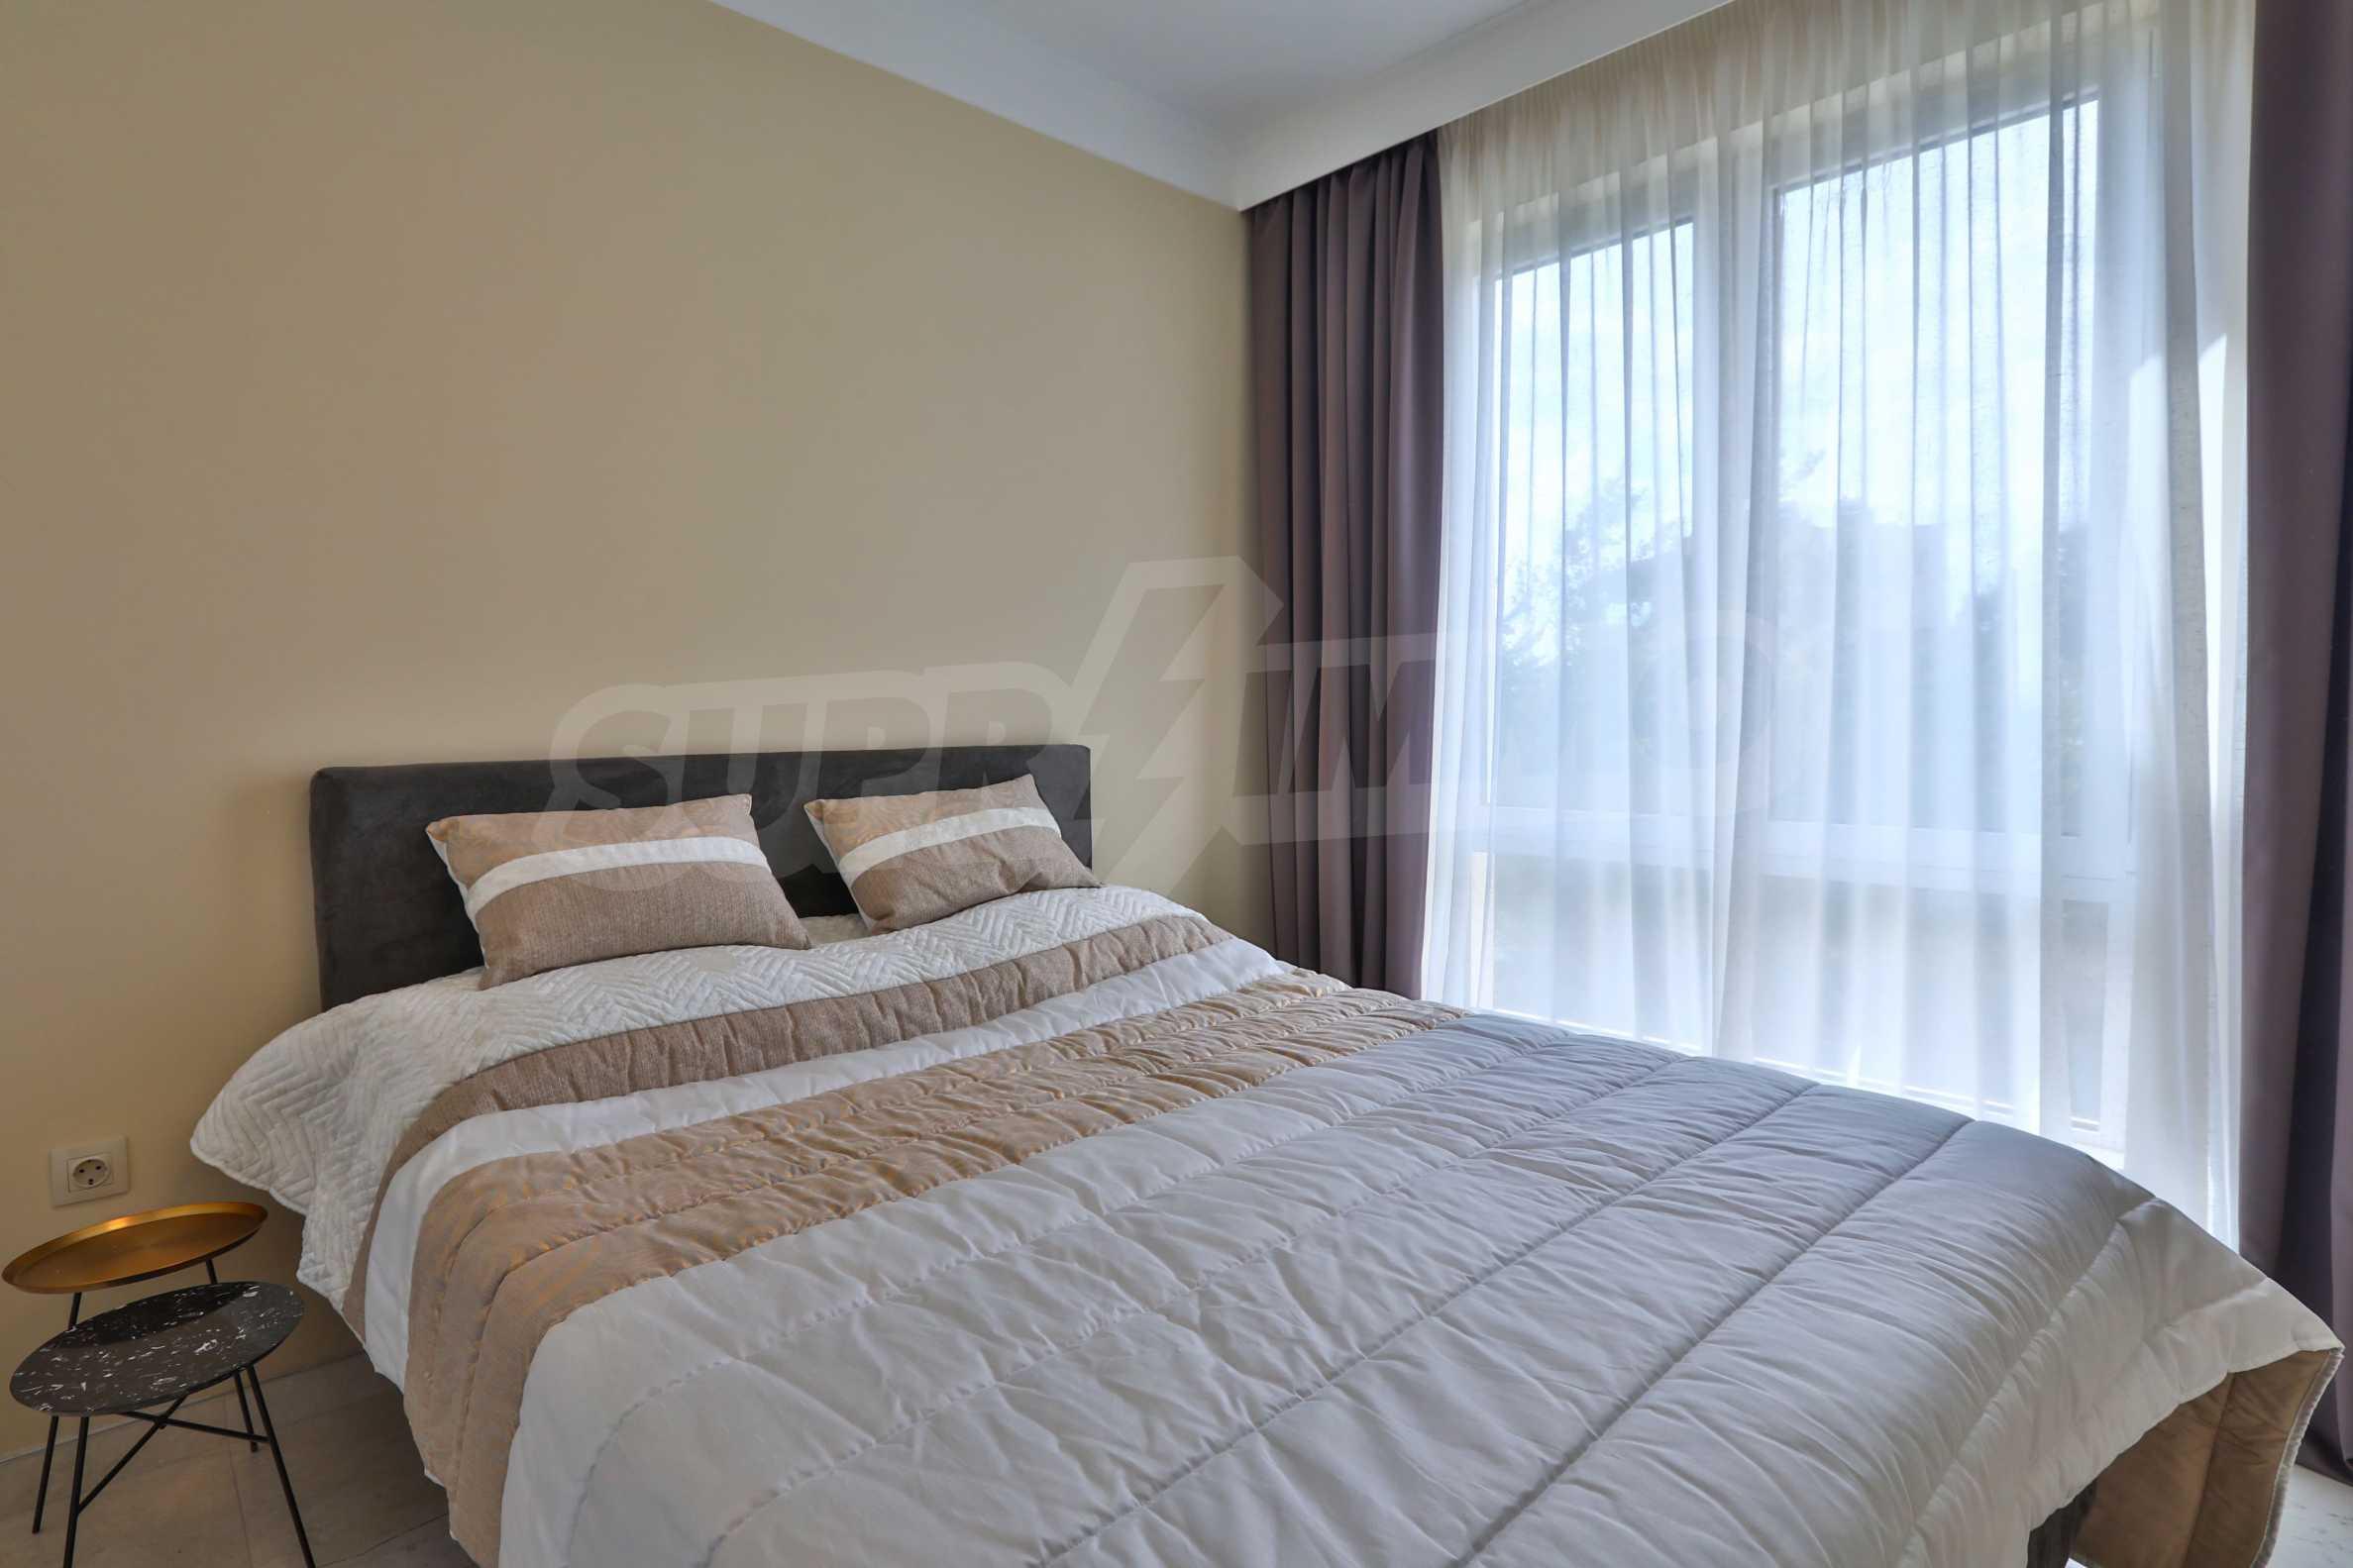 Дизайнерски тристаен апартамент под наем за летен сезон в резиденция Belle Époque в Лозенец 21